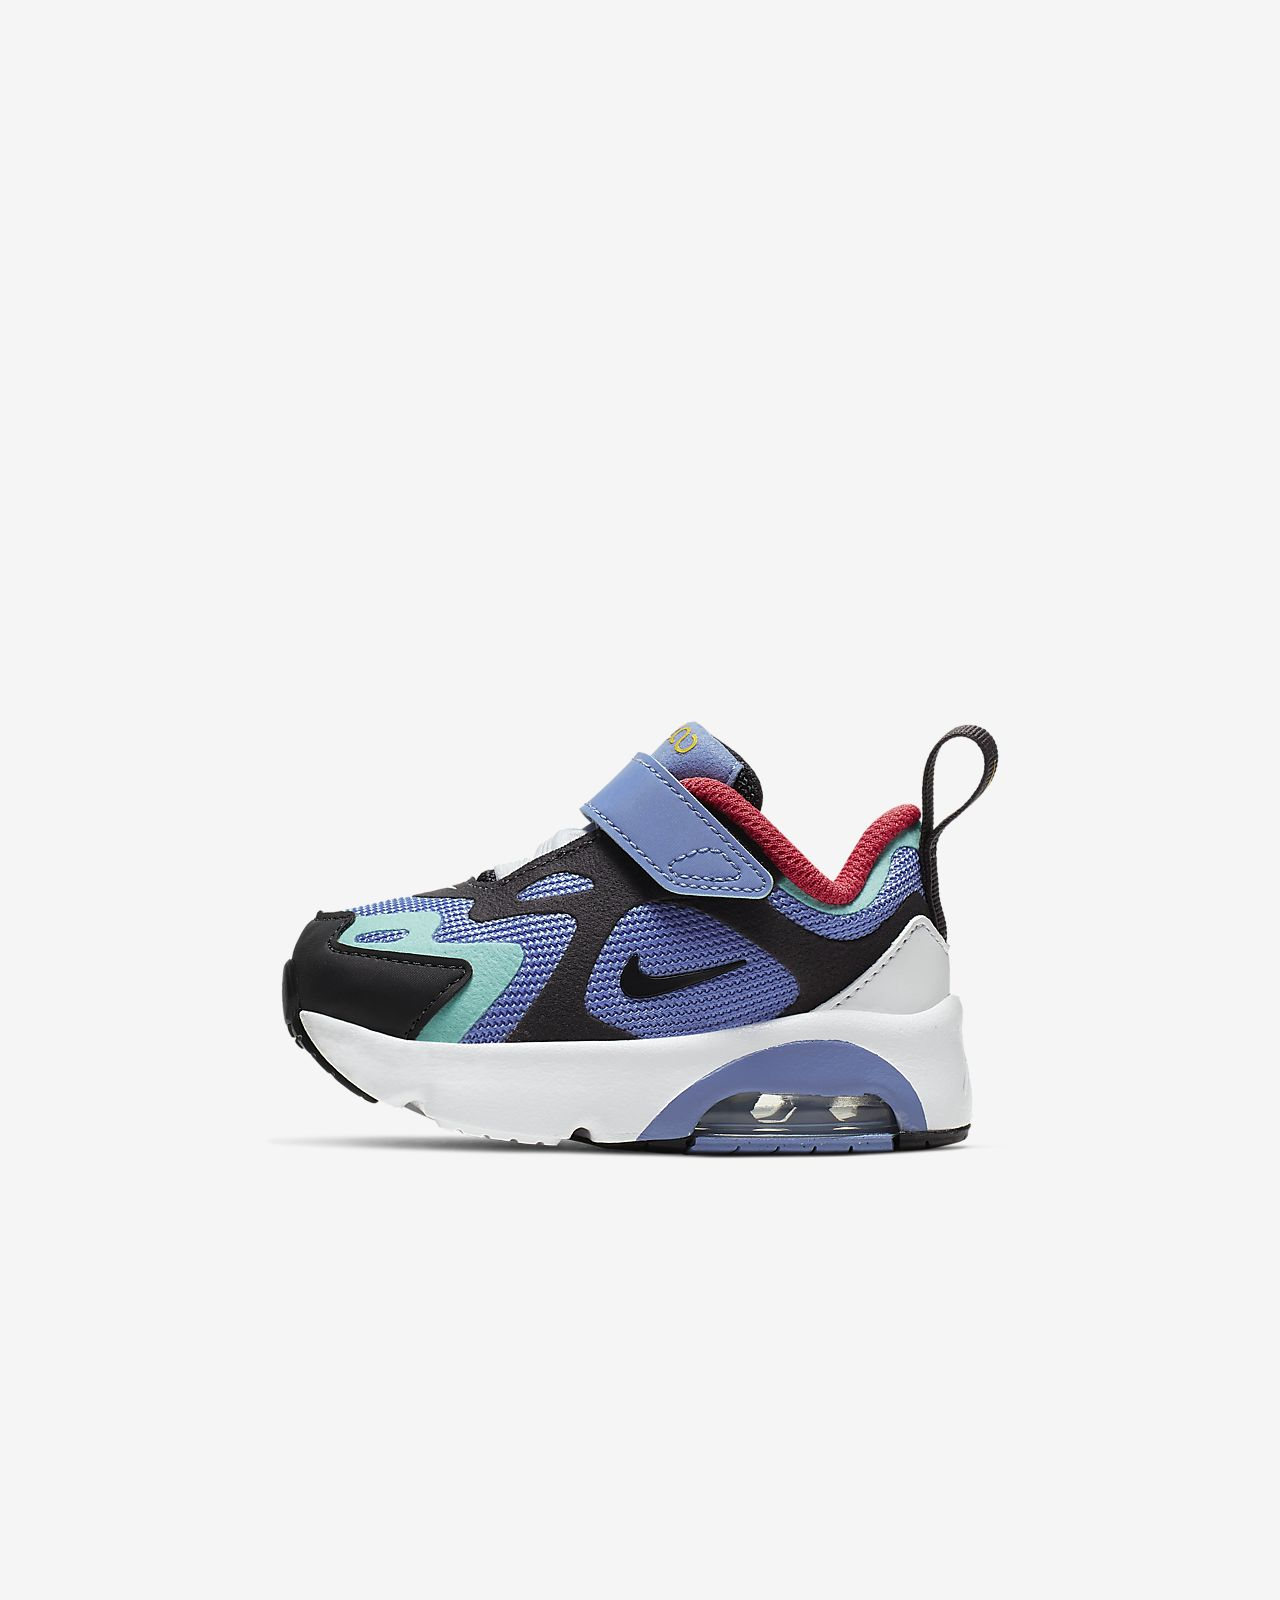 Nike Air Max 200 sko til sped-/småbarn